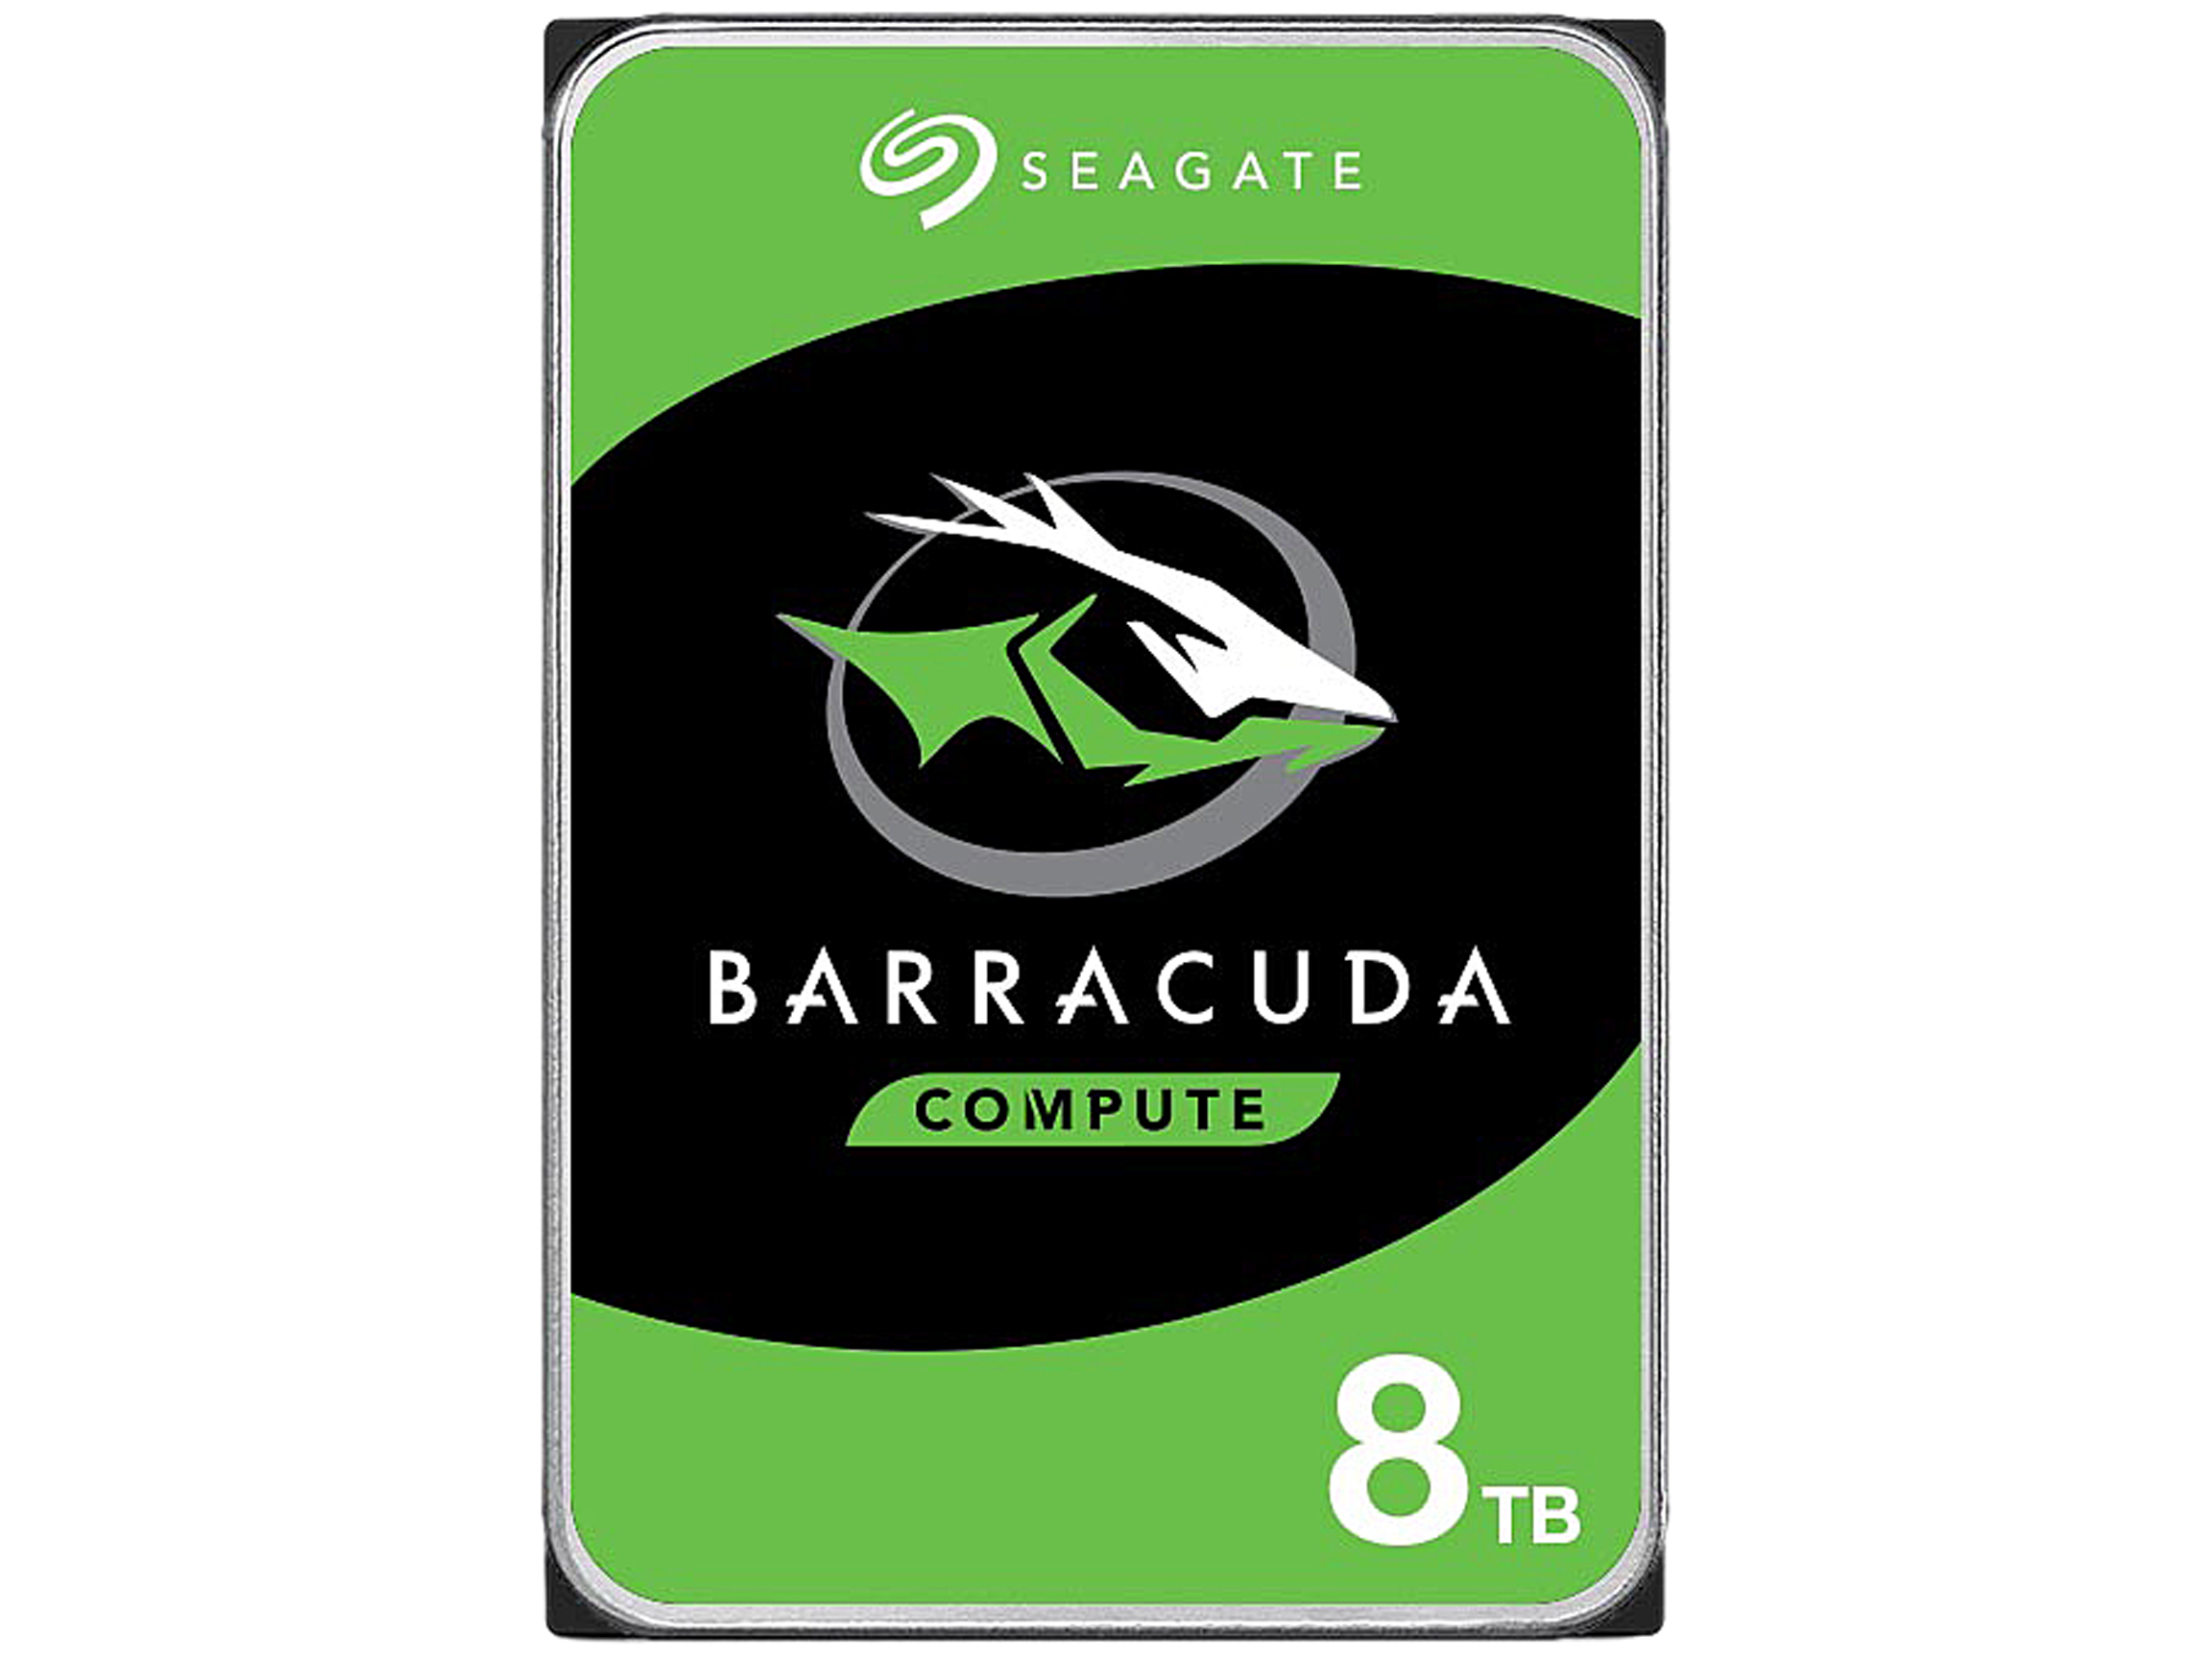 Seagate BarraCuda 8TB 3.5